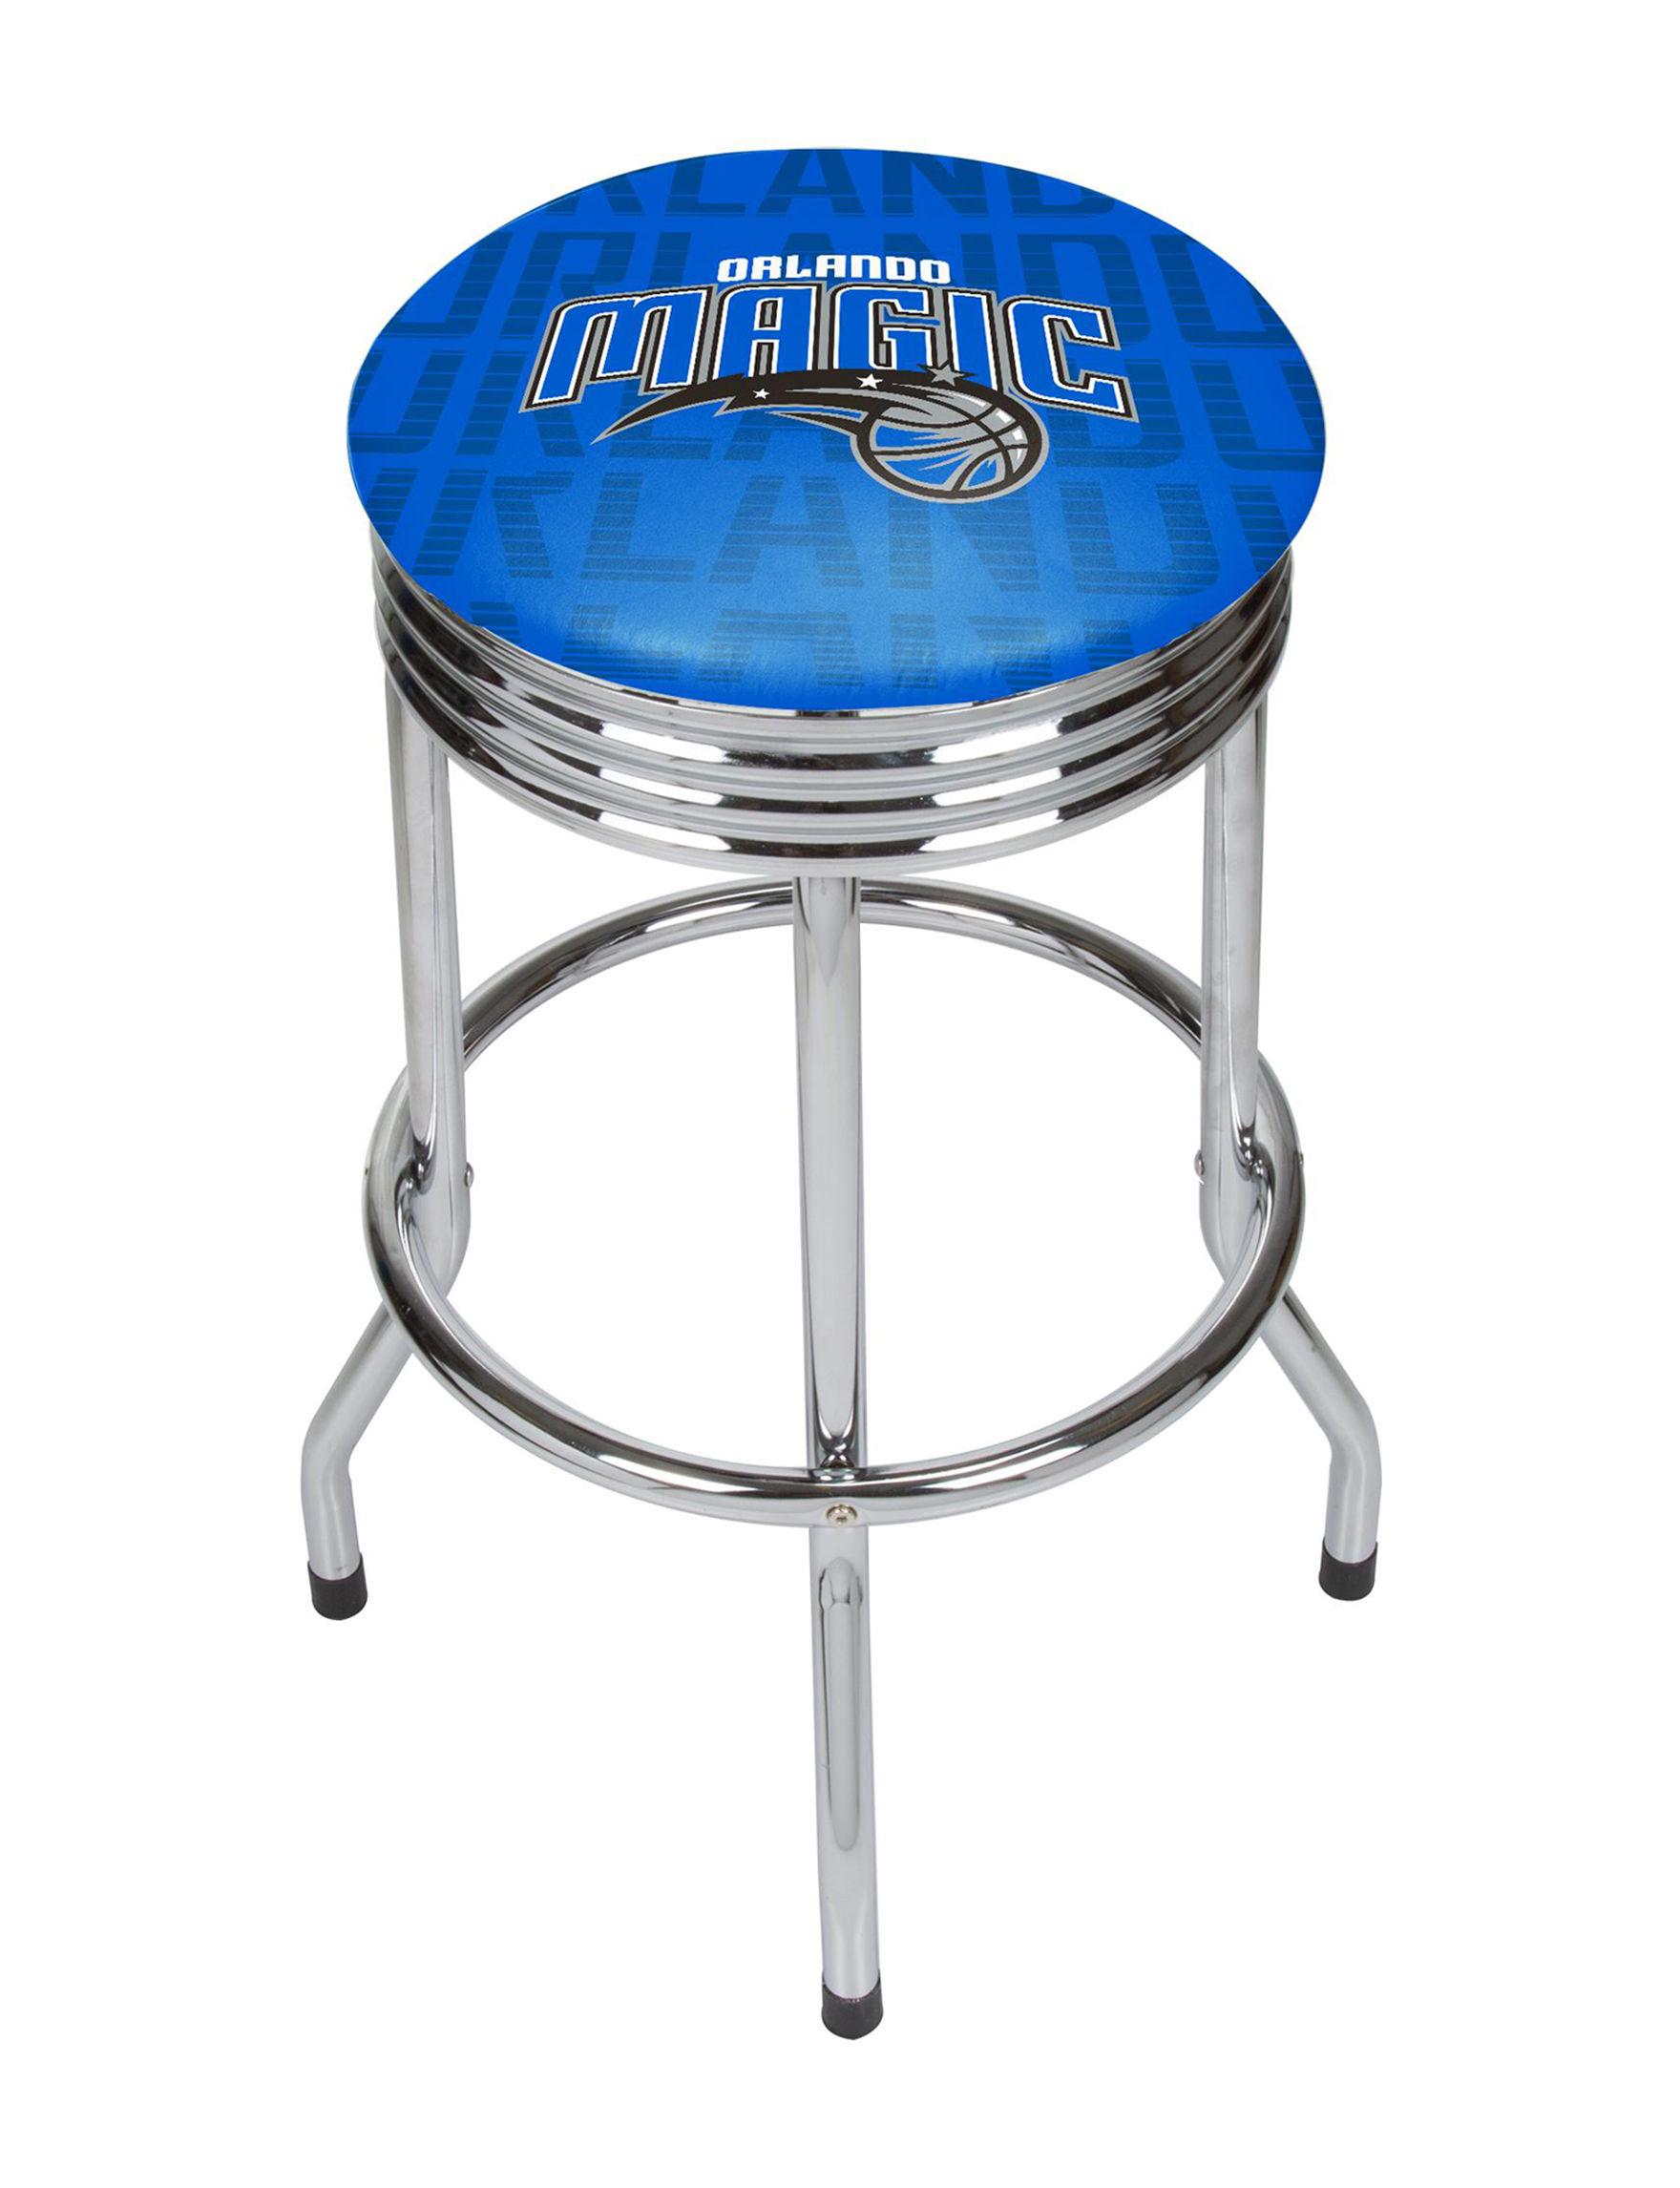 NBA Blue / White / Black Bar & Kitchen Stools Kitchen & Dining Furniture